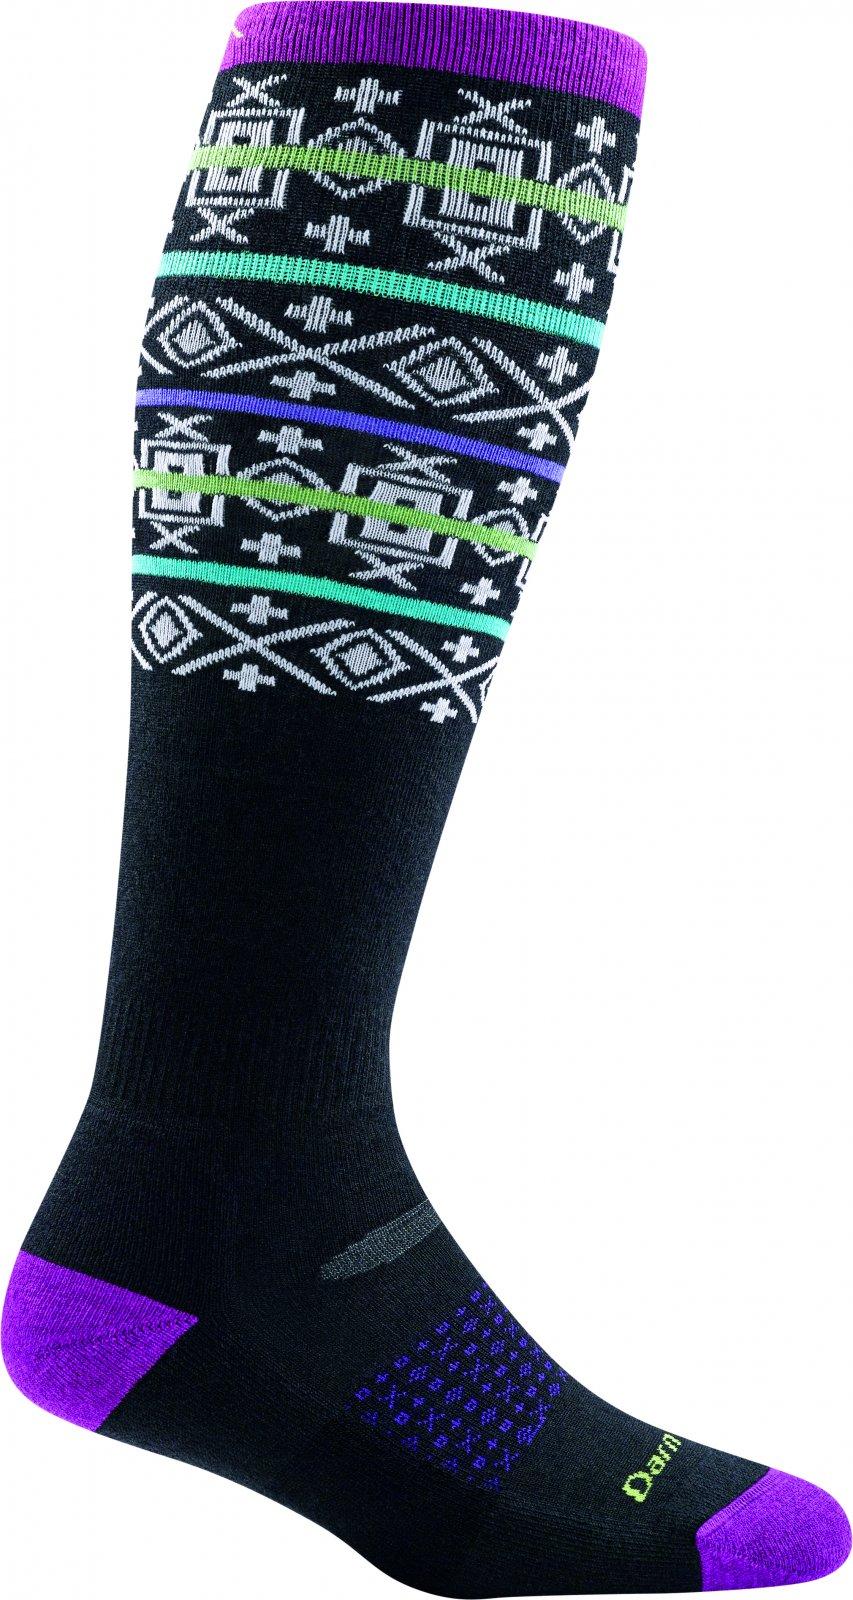 Darn Tough Northstar OTC Midweight Snowboard Socks